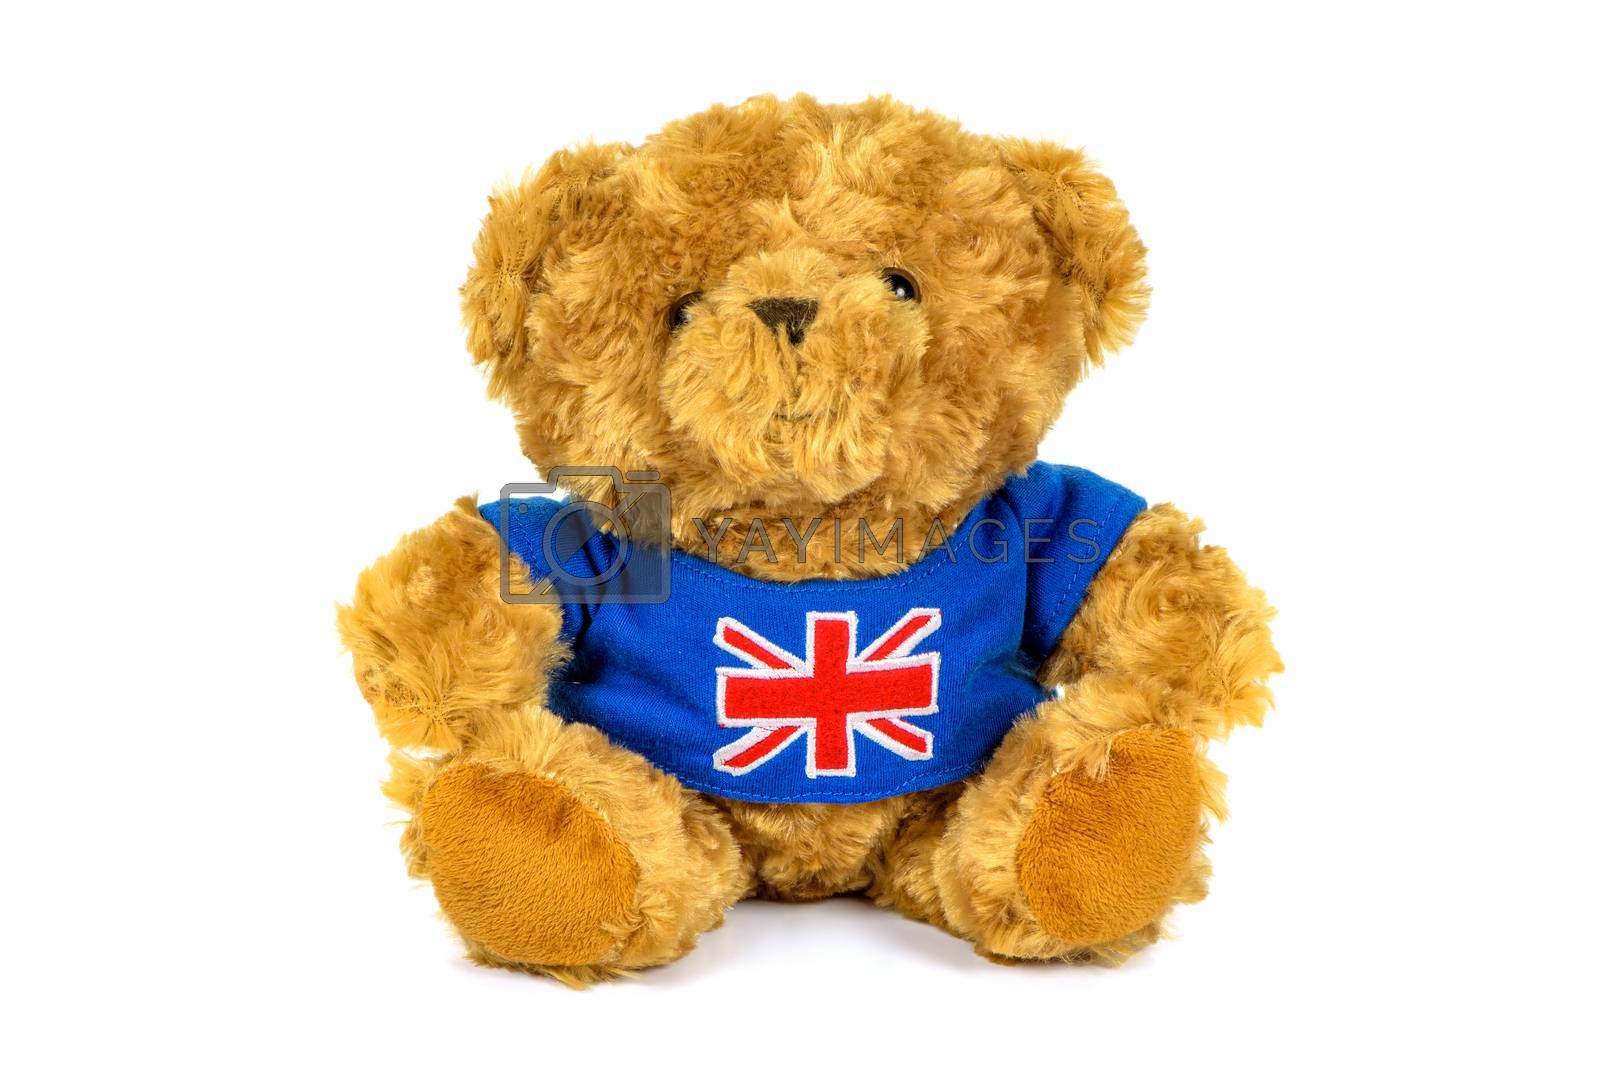 Teddy bear with UK flag isolated on white background